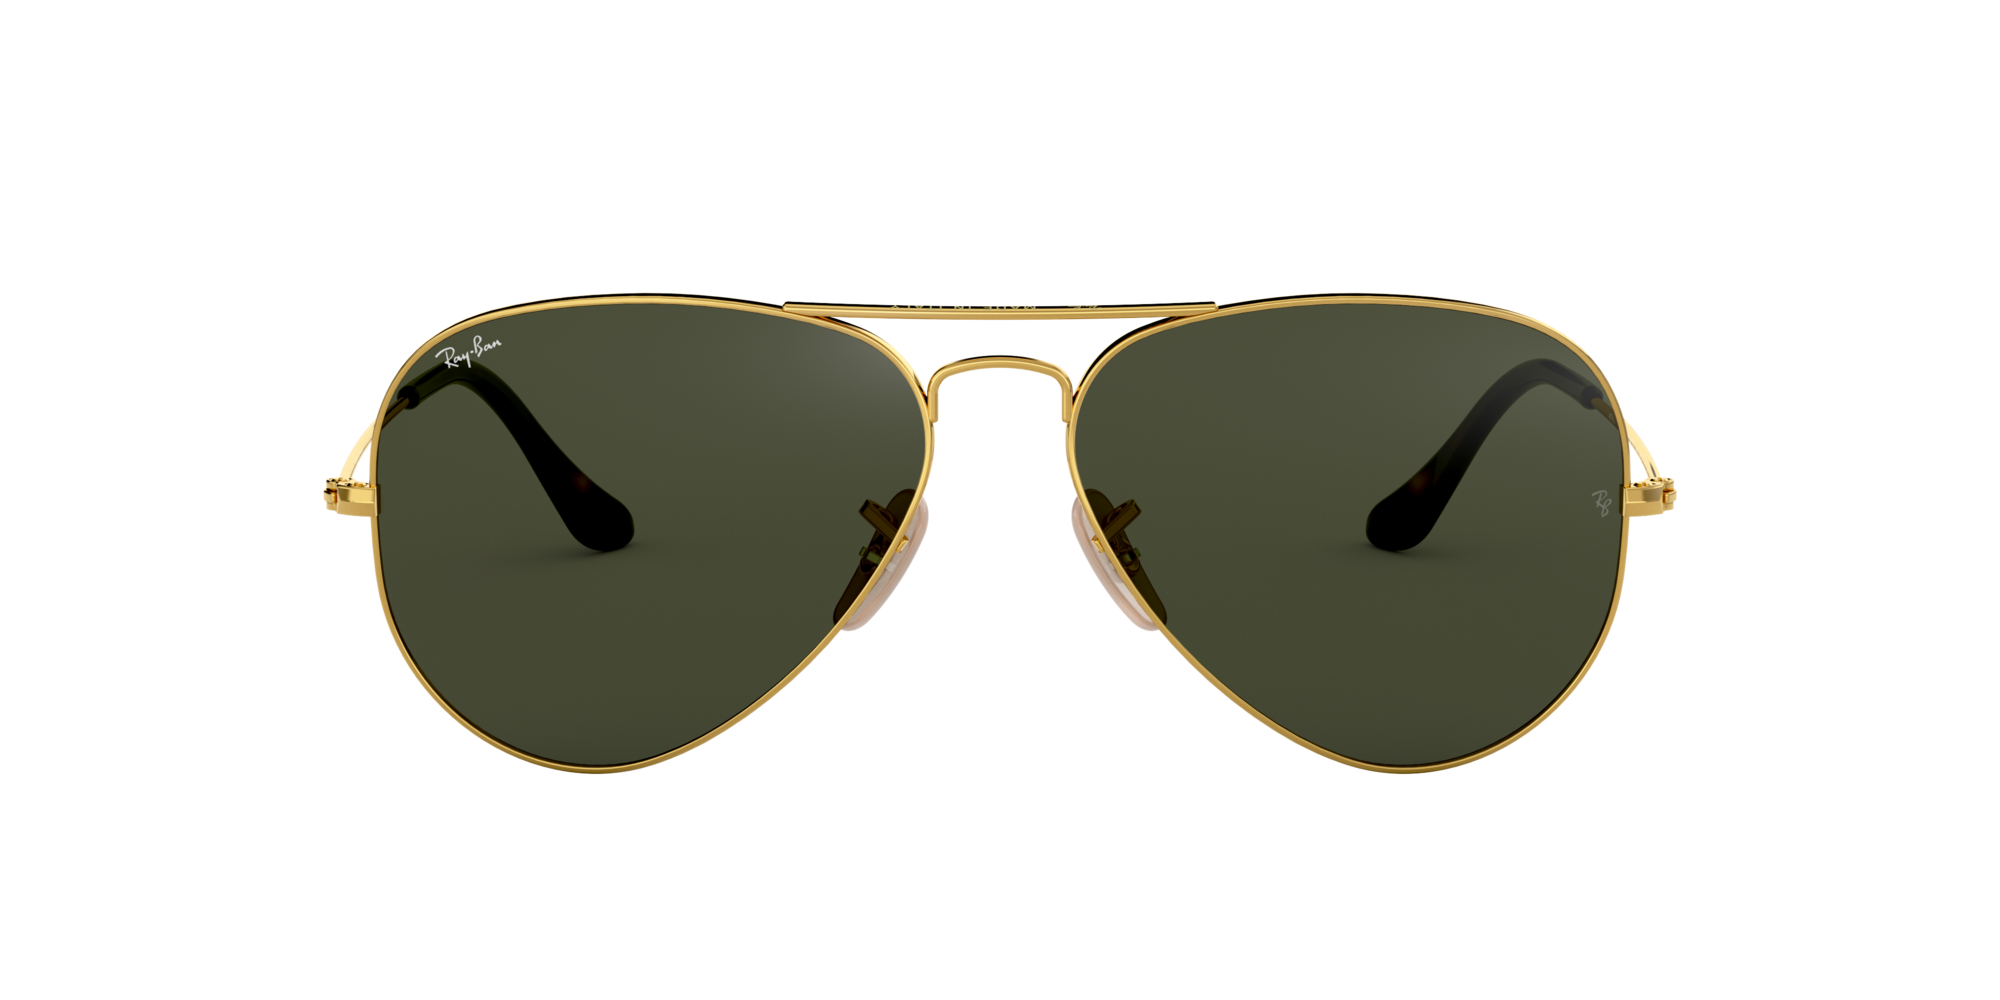 RayBan sunglasses image